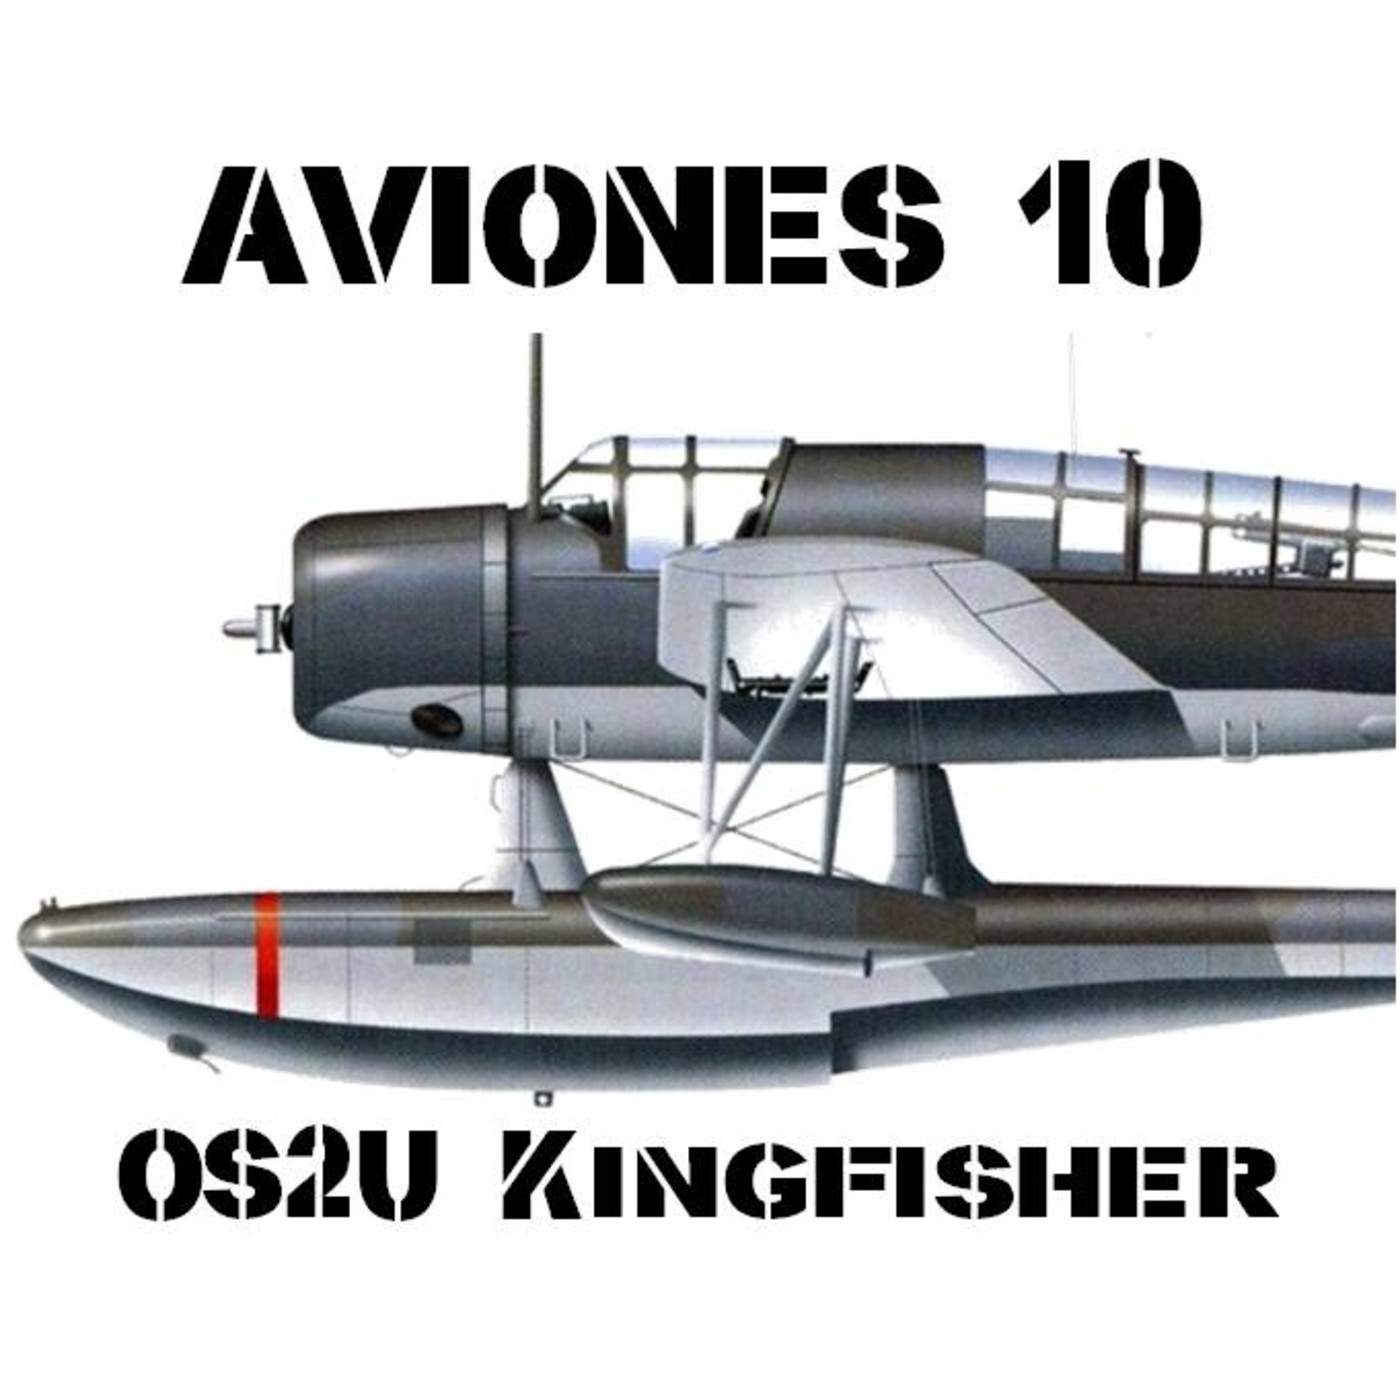 AVIONES 10 #82 Vought OS2U Kingfisher